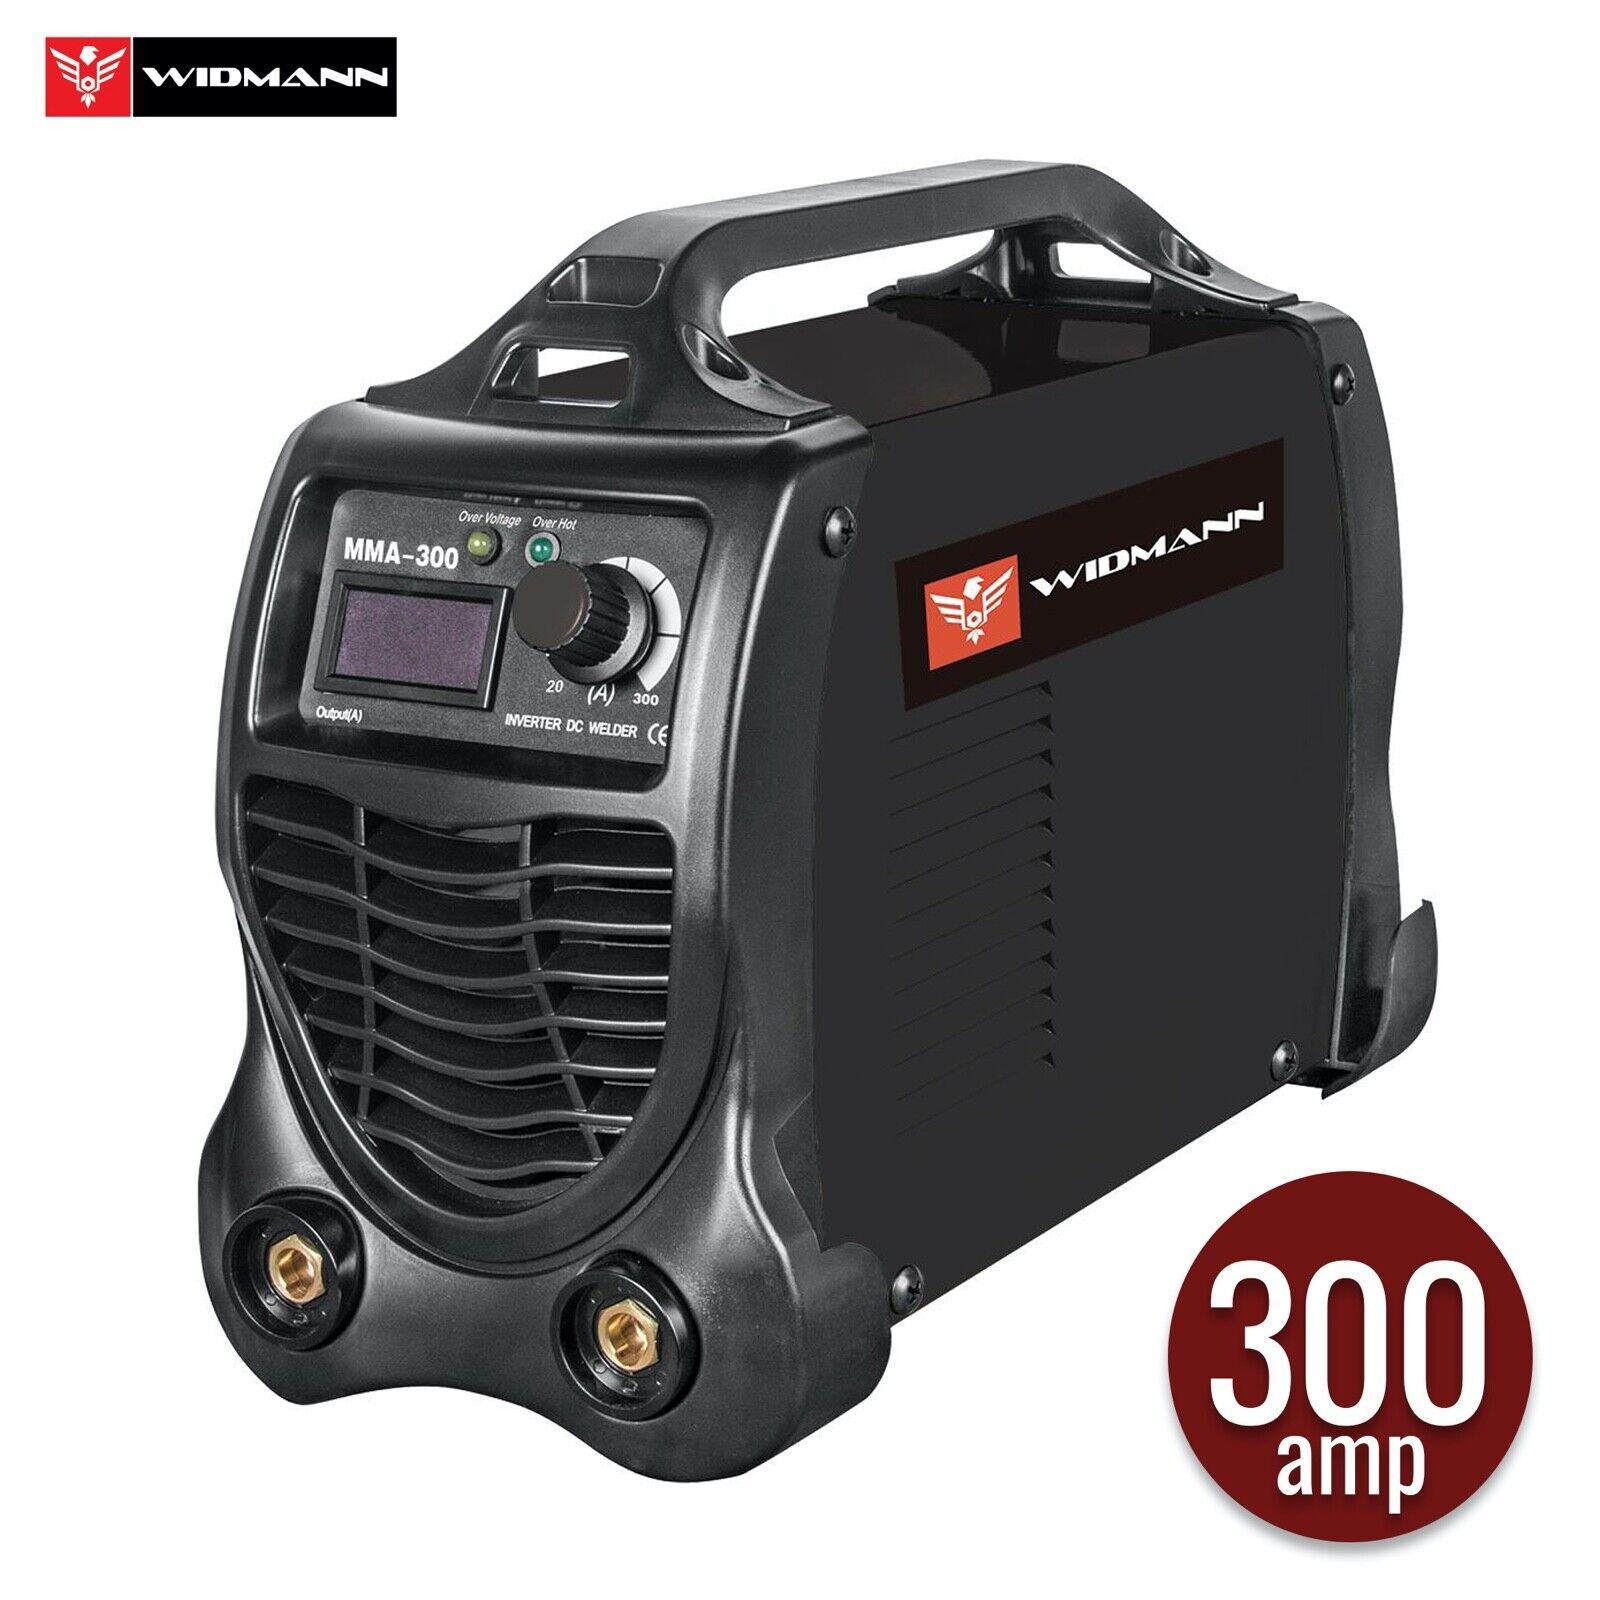 Widmann MMA-300: Elektro Schweißgerät 300A IGBT-Wechselrichterschweißmaschine